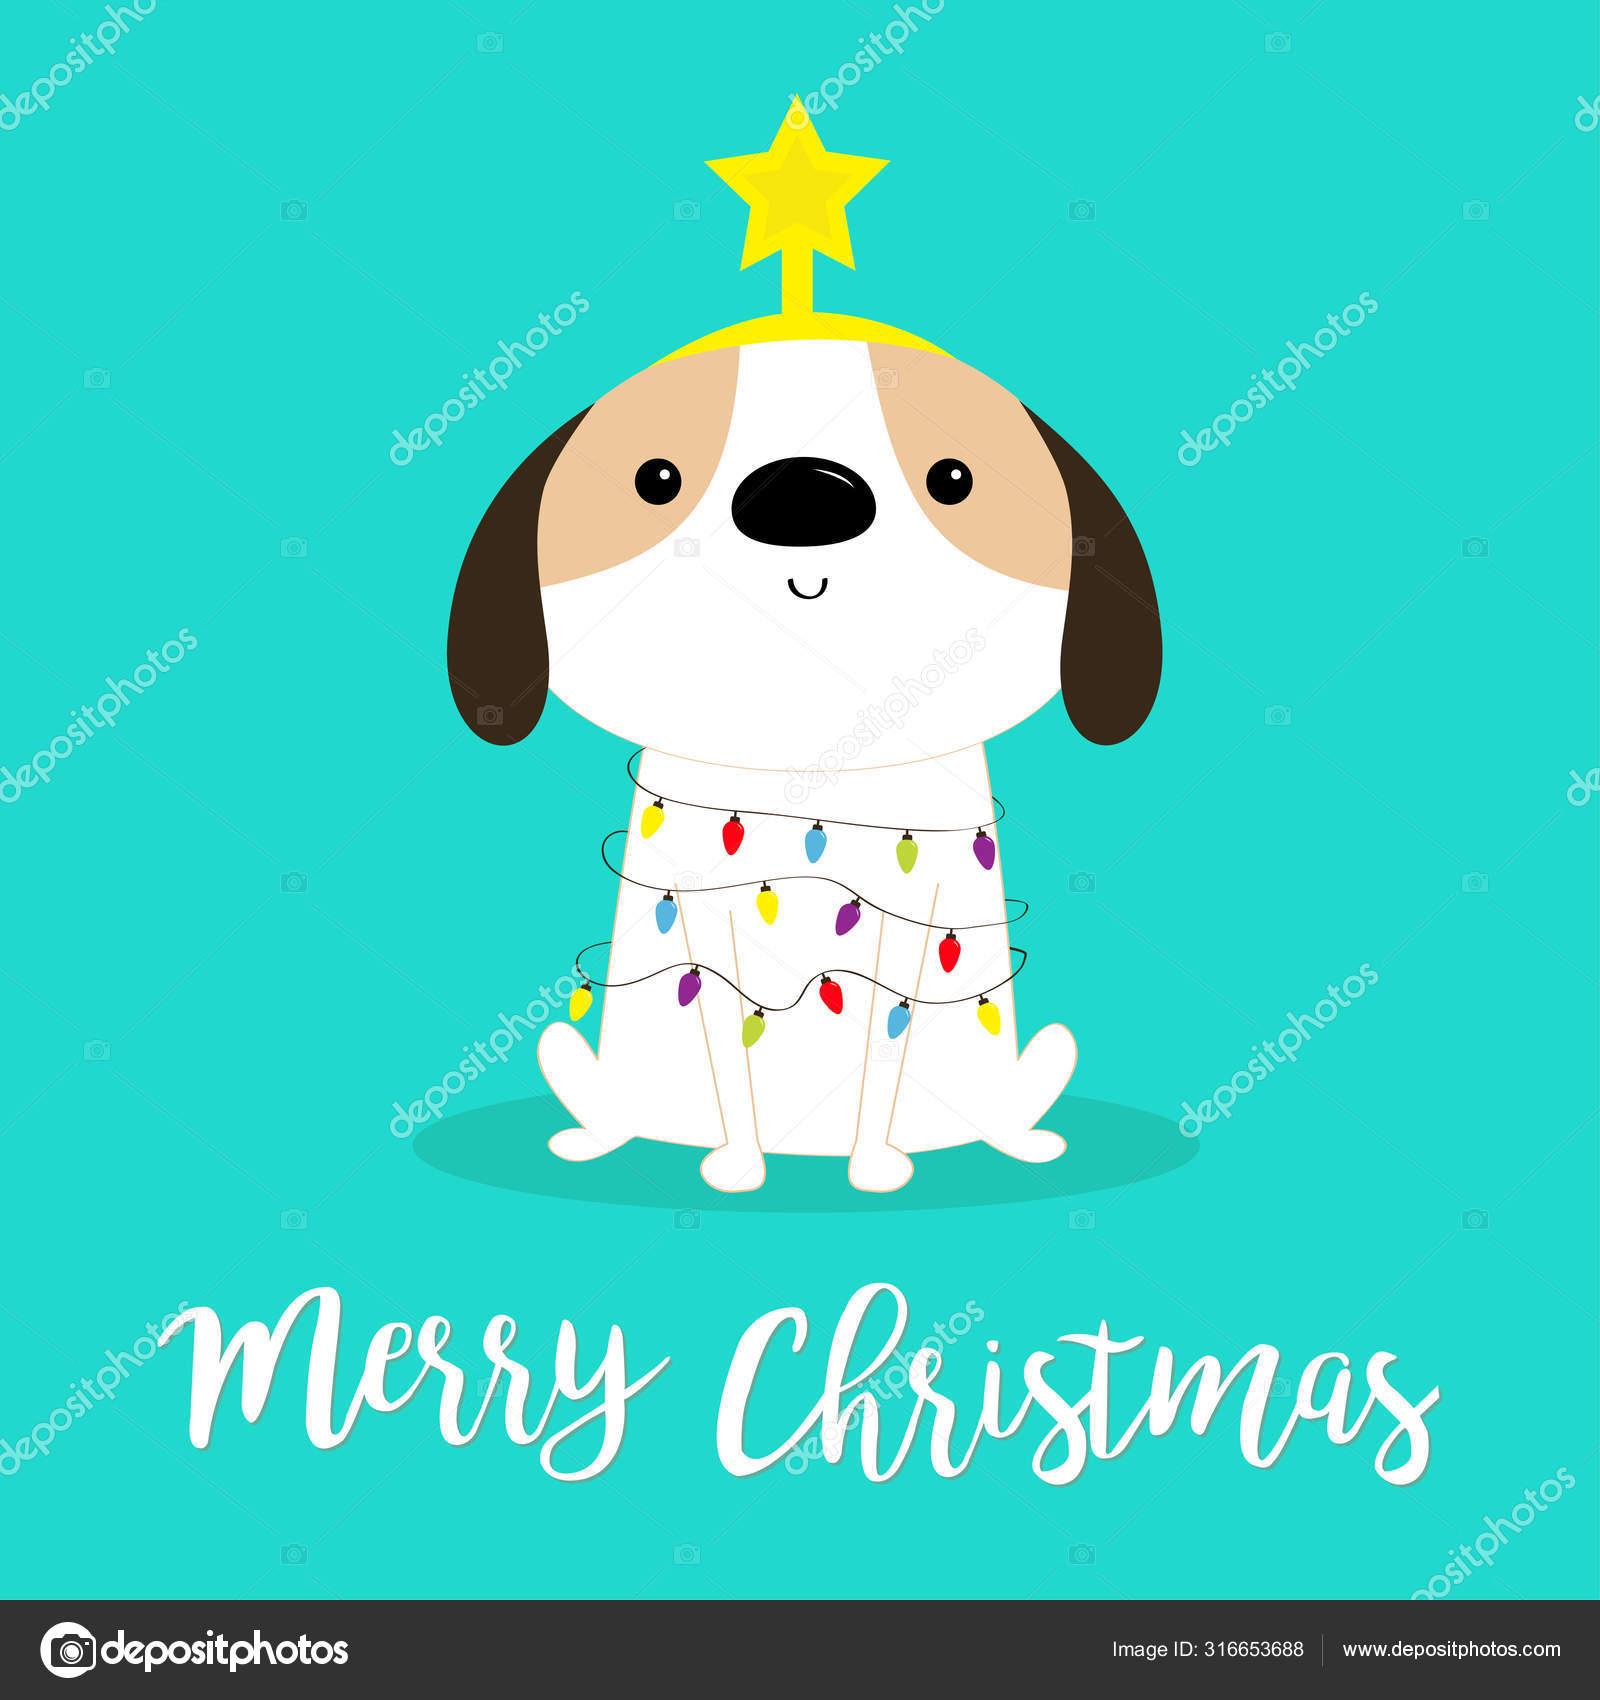 Merry Christmas Dog Fir Tree Shape Garland Lights Bulb String Star Puppy Pooch Sitting Funny Kawaii